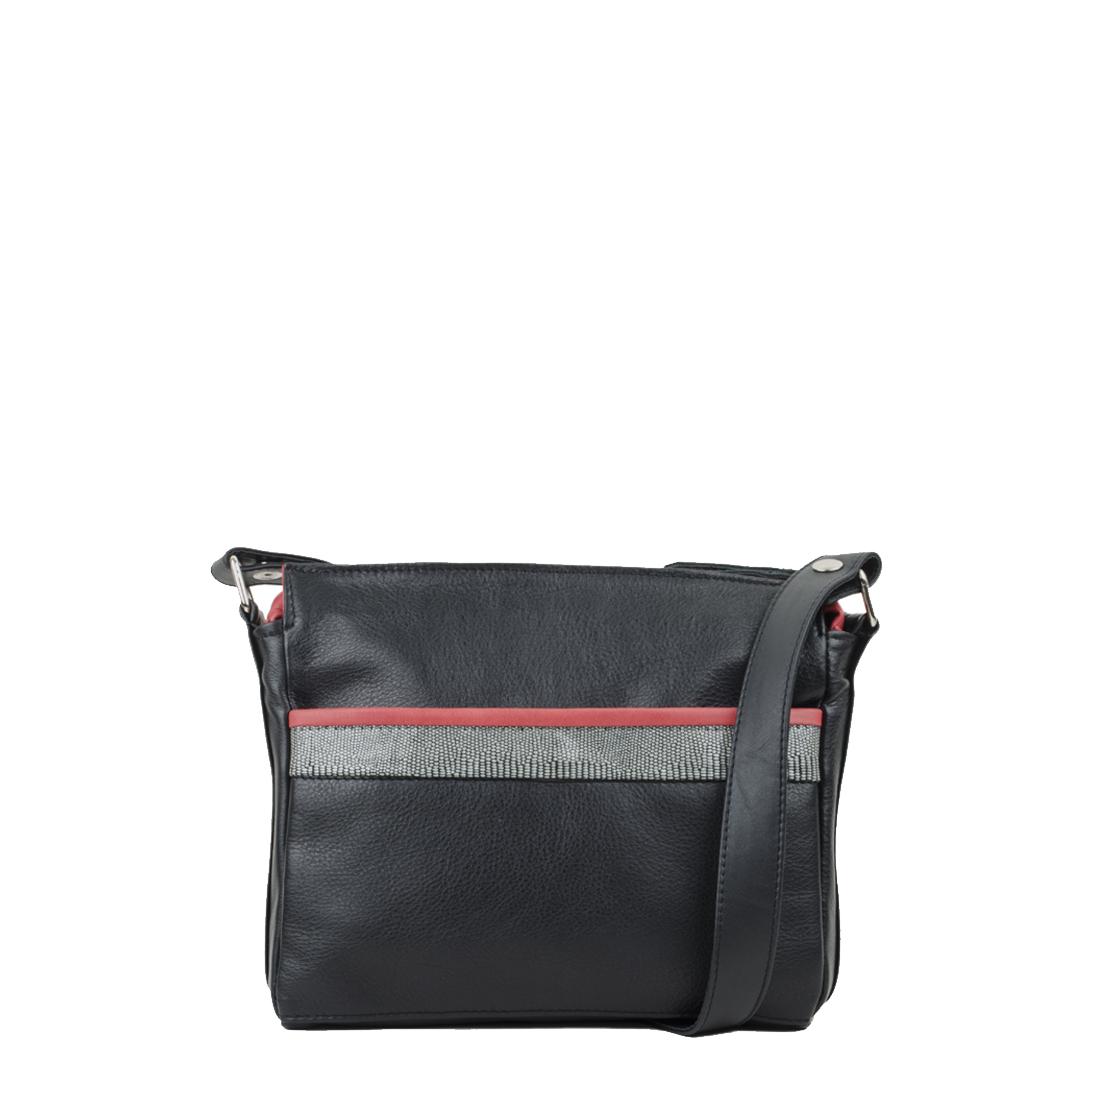 Layla Black Red Across Body Bag